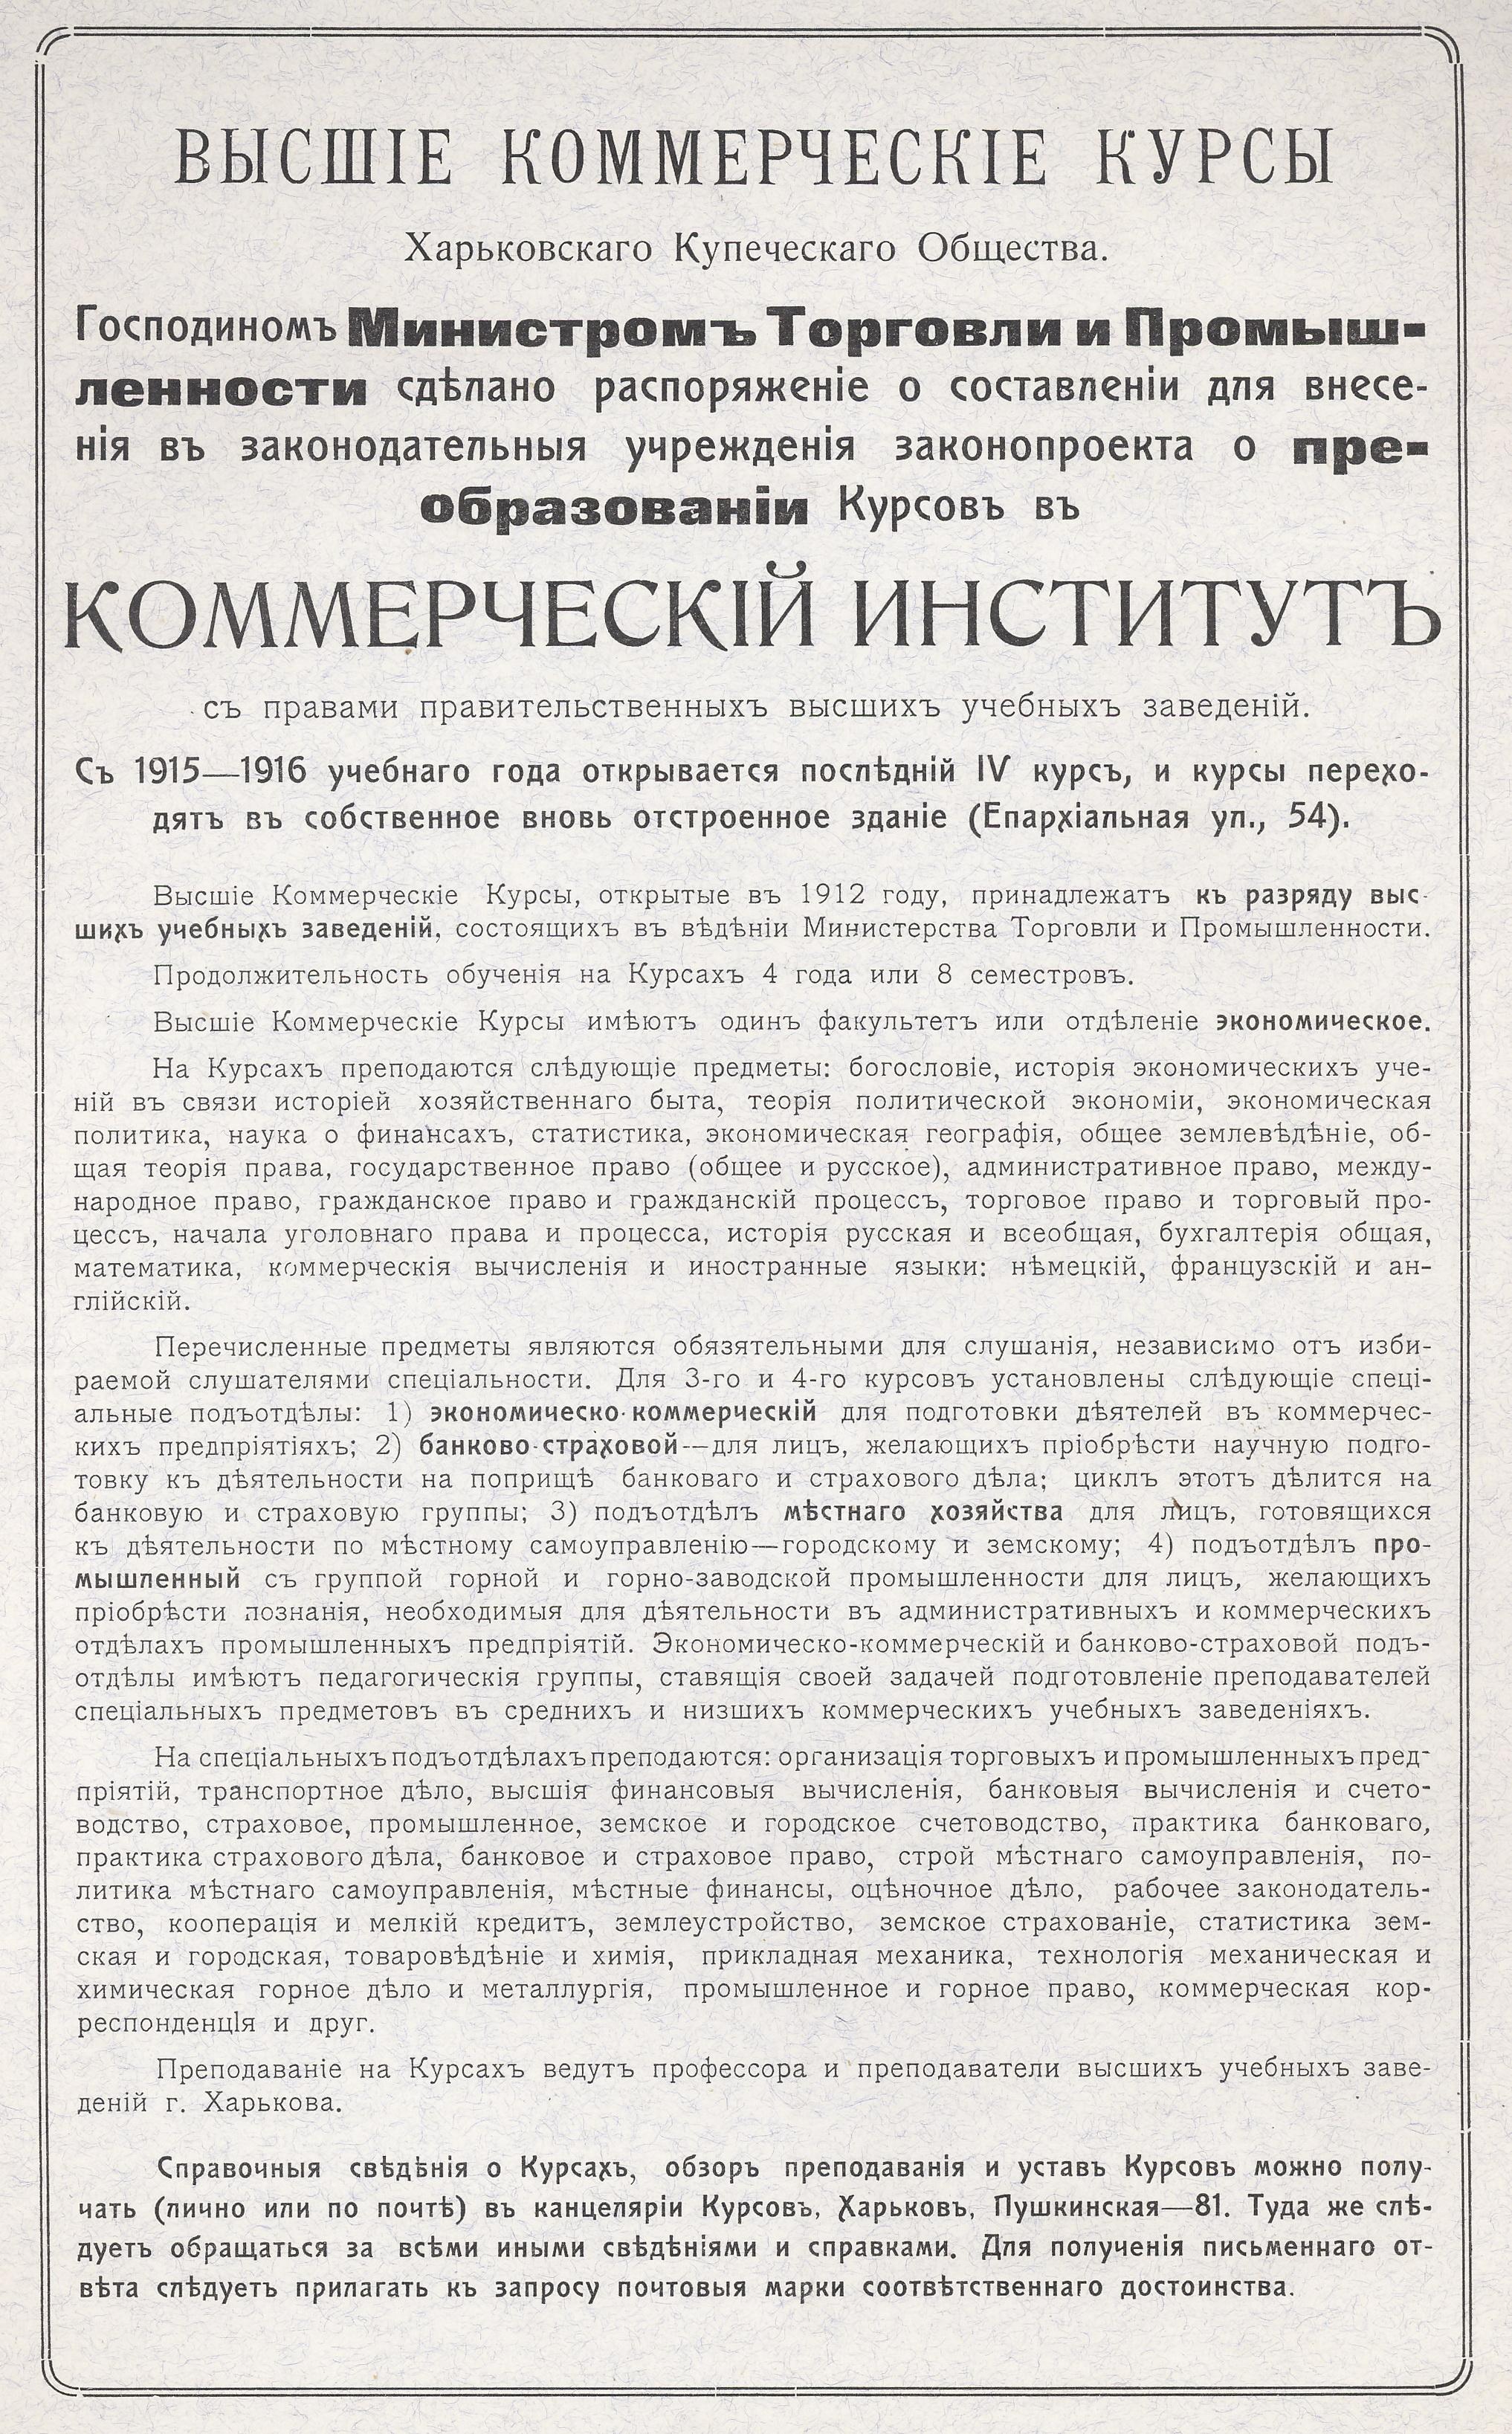 газета доска объявлений знакомств москва